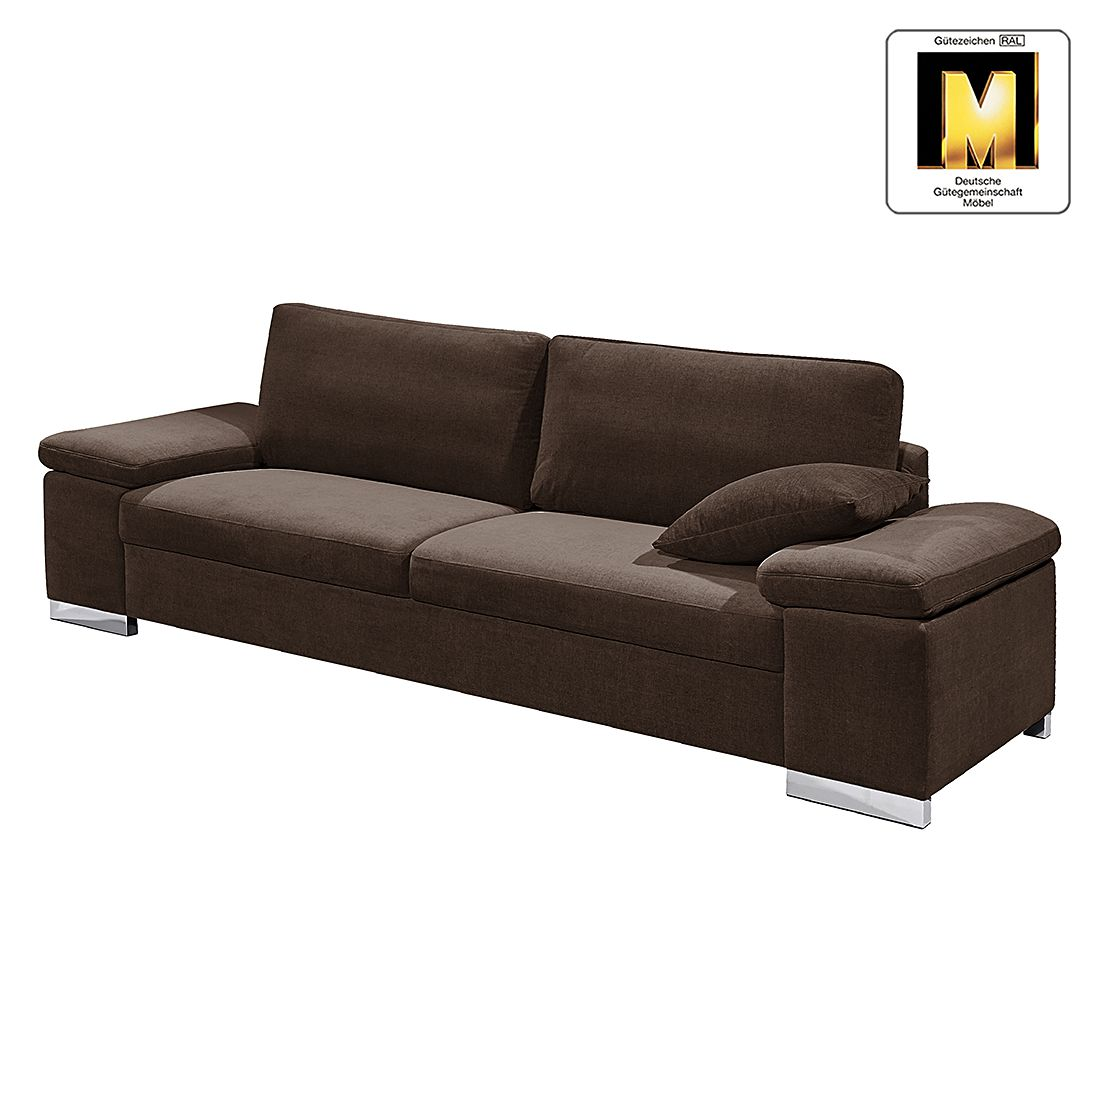 Sofa Casual Line V (2,5-Sitzer) – Velours – Dunkelbraun, Claas Claasen kaufen